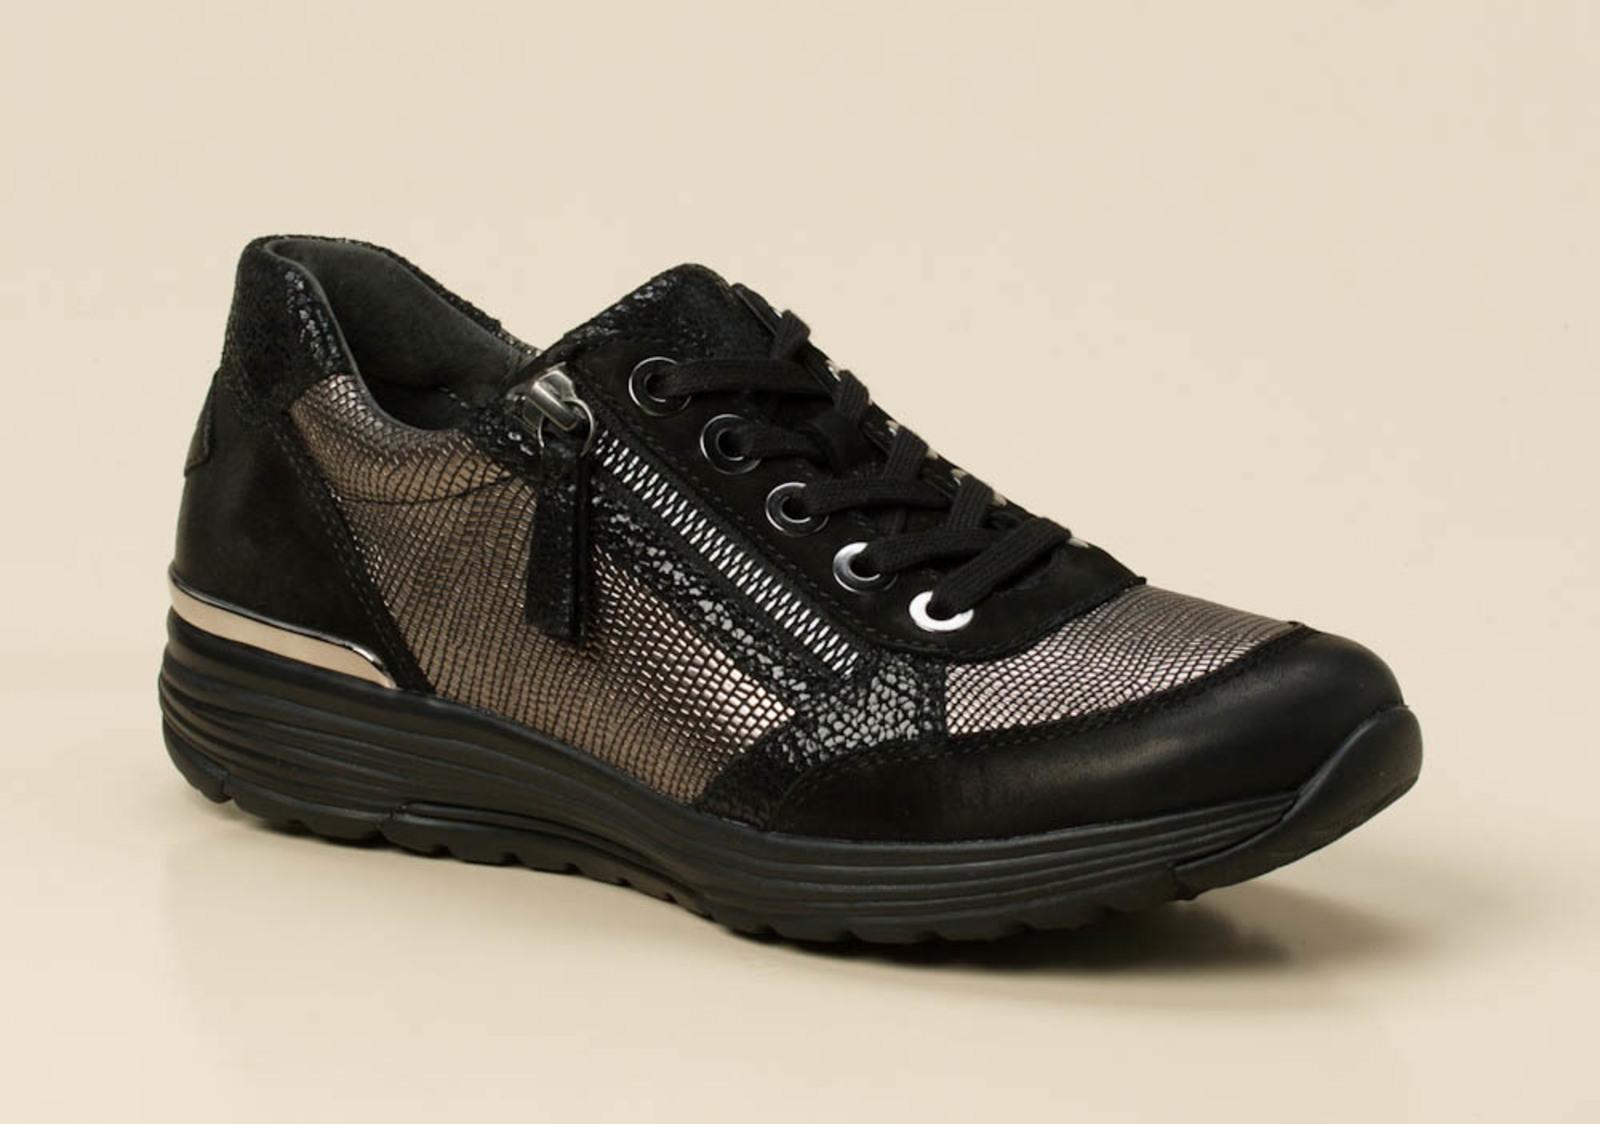 gabor comfort damen sneaker in schwarz grau kaufen zumnorde online shop. Black Bedroom Furniture Sets. Home Design Ideas